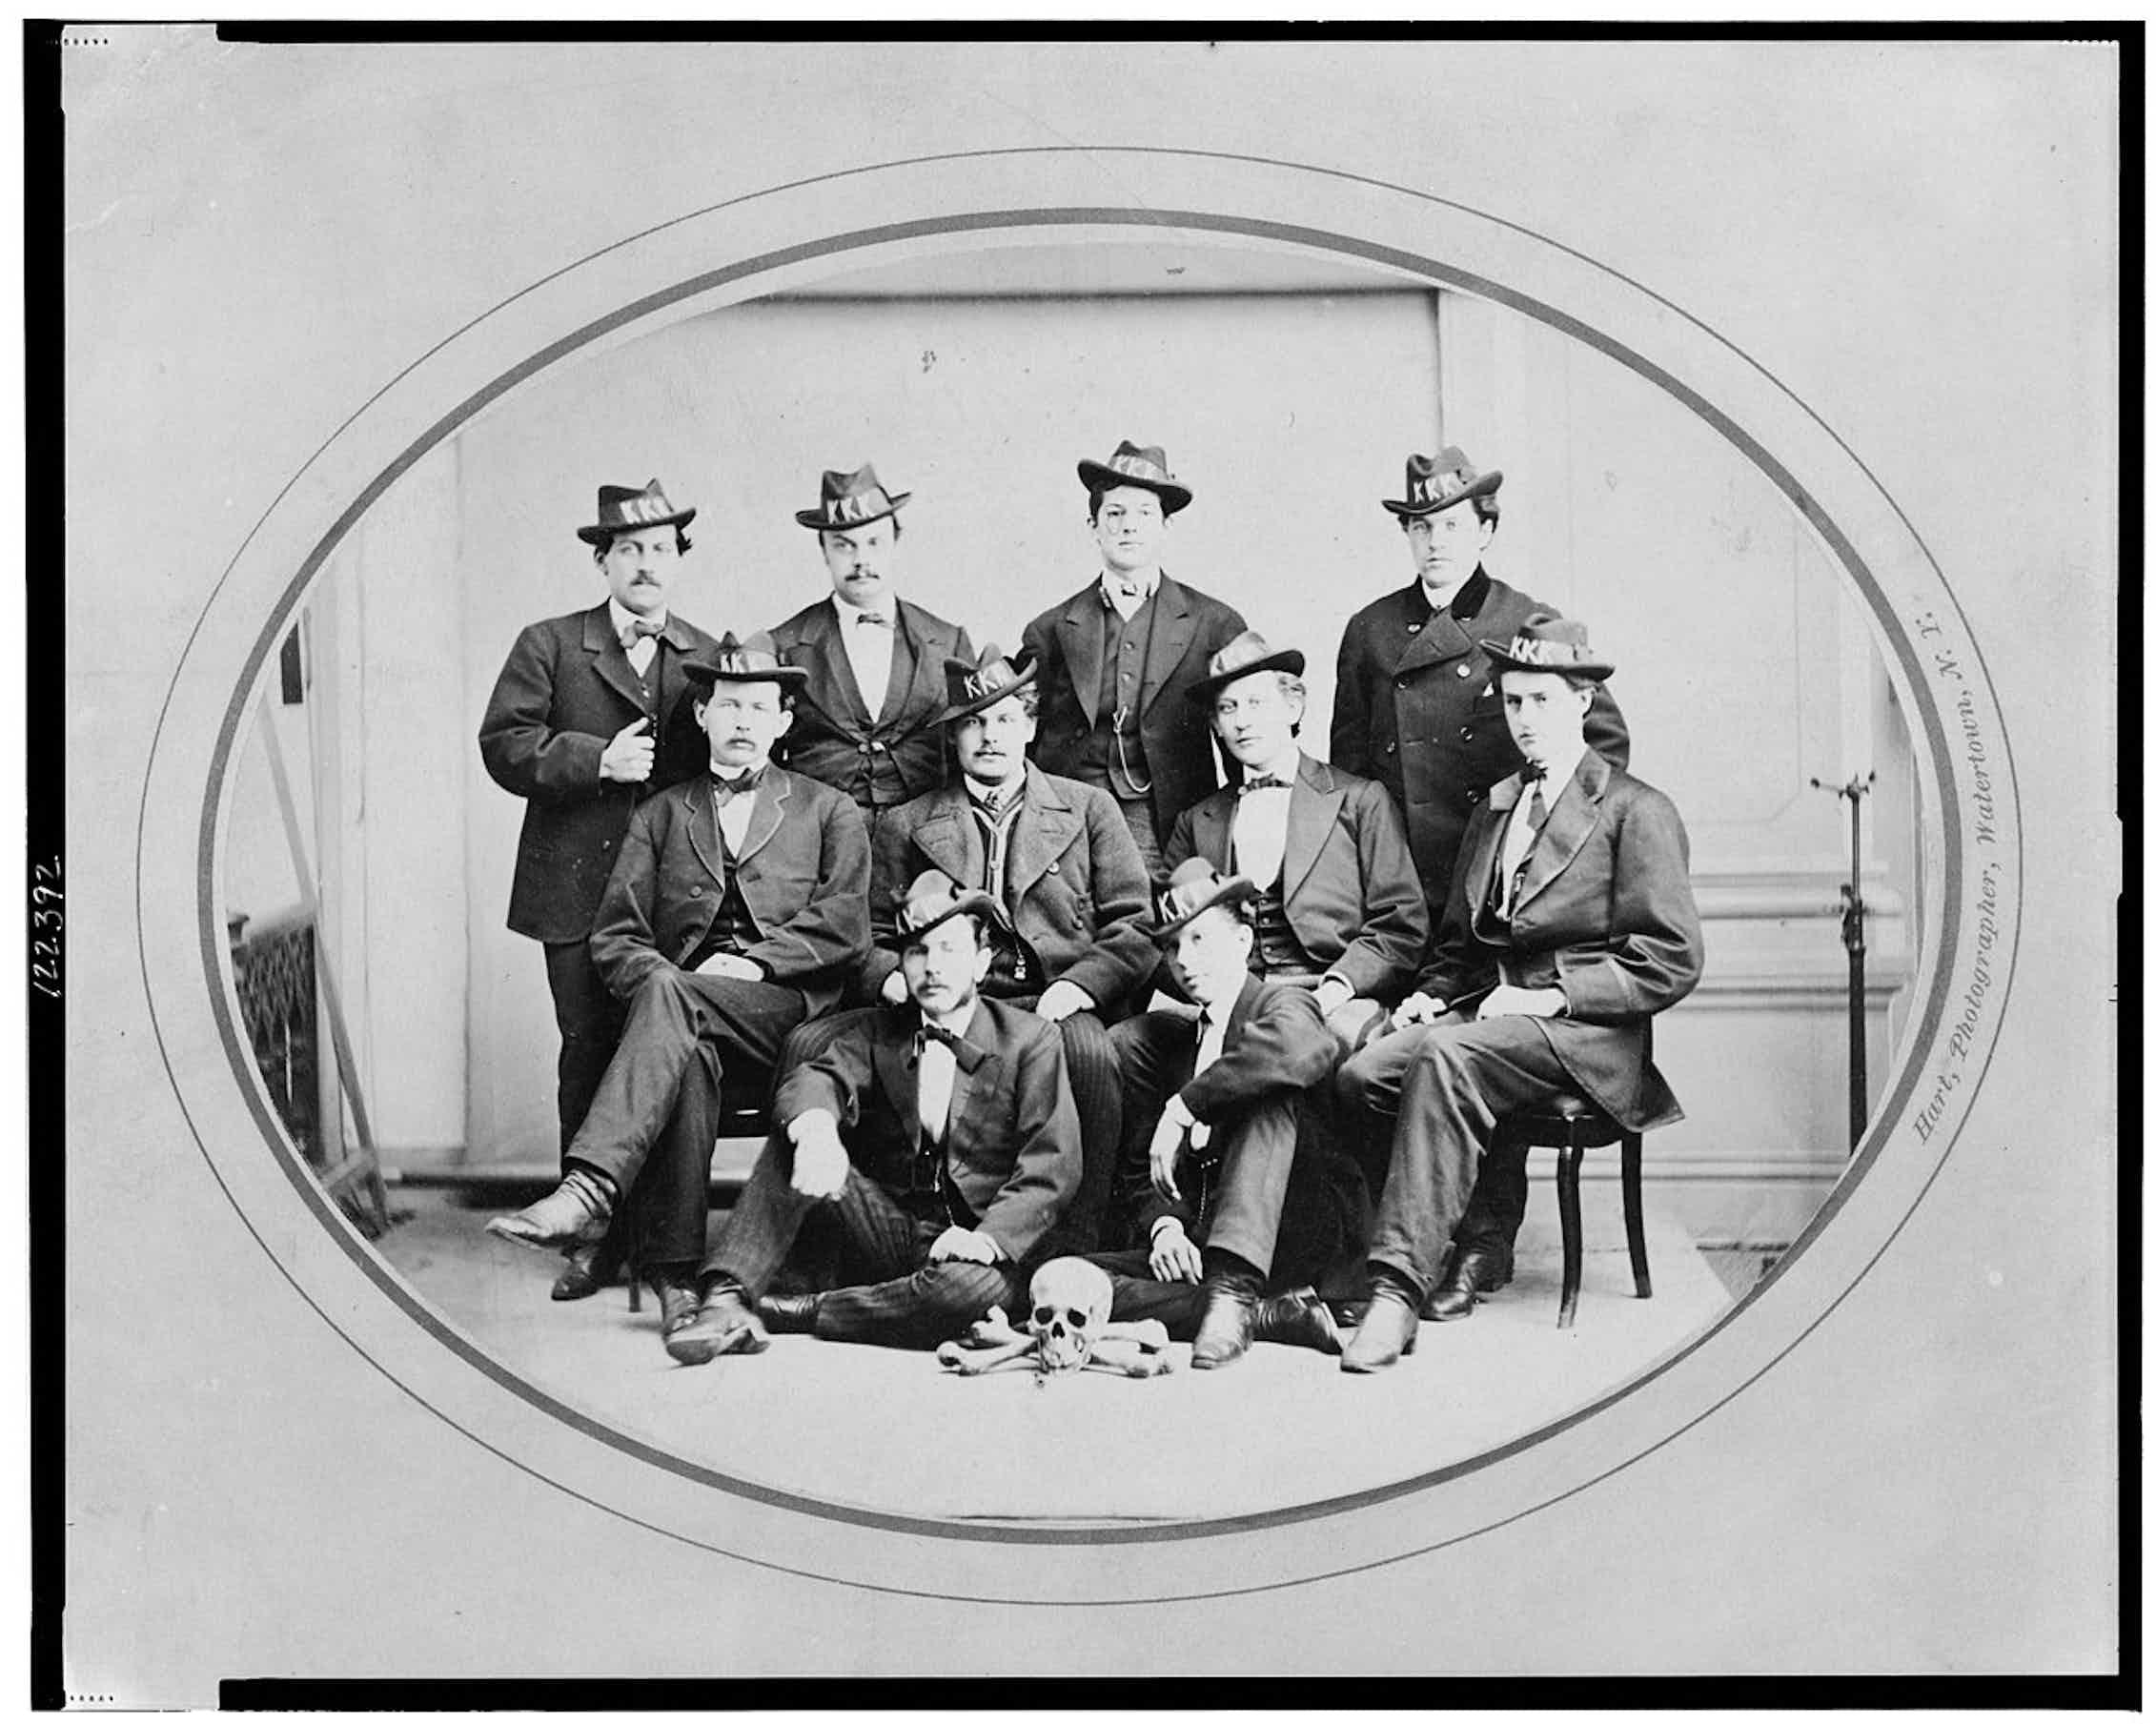 División Watertown del Ku Klux Klan. Foto de Hart, 1870.Wikimedia Commons / Library of Congress